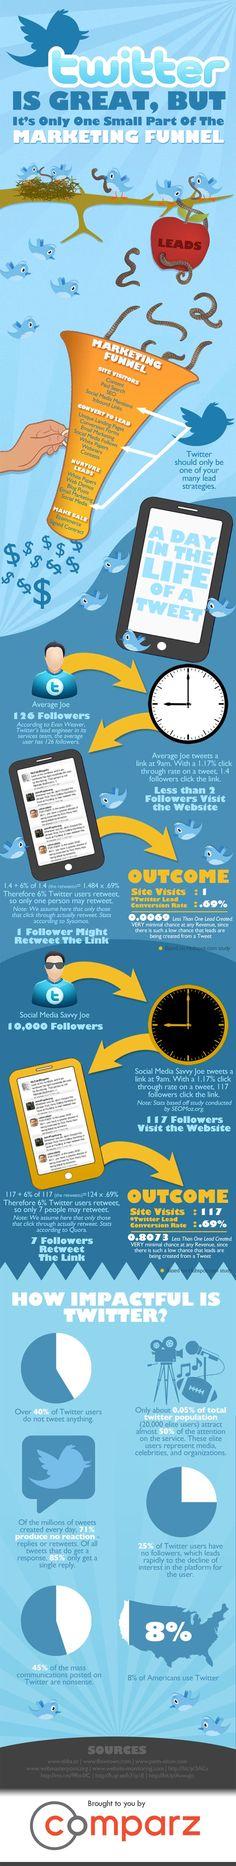 The Marketing Funnel infographic Inbound Marketing, Marketing En Internet, The Marketing, Mobile Marketing, Marketing Digital, Business Marketing, Content Marketing, Online Marketing, Social Media Marketing